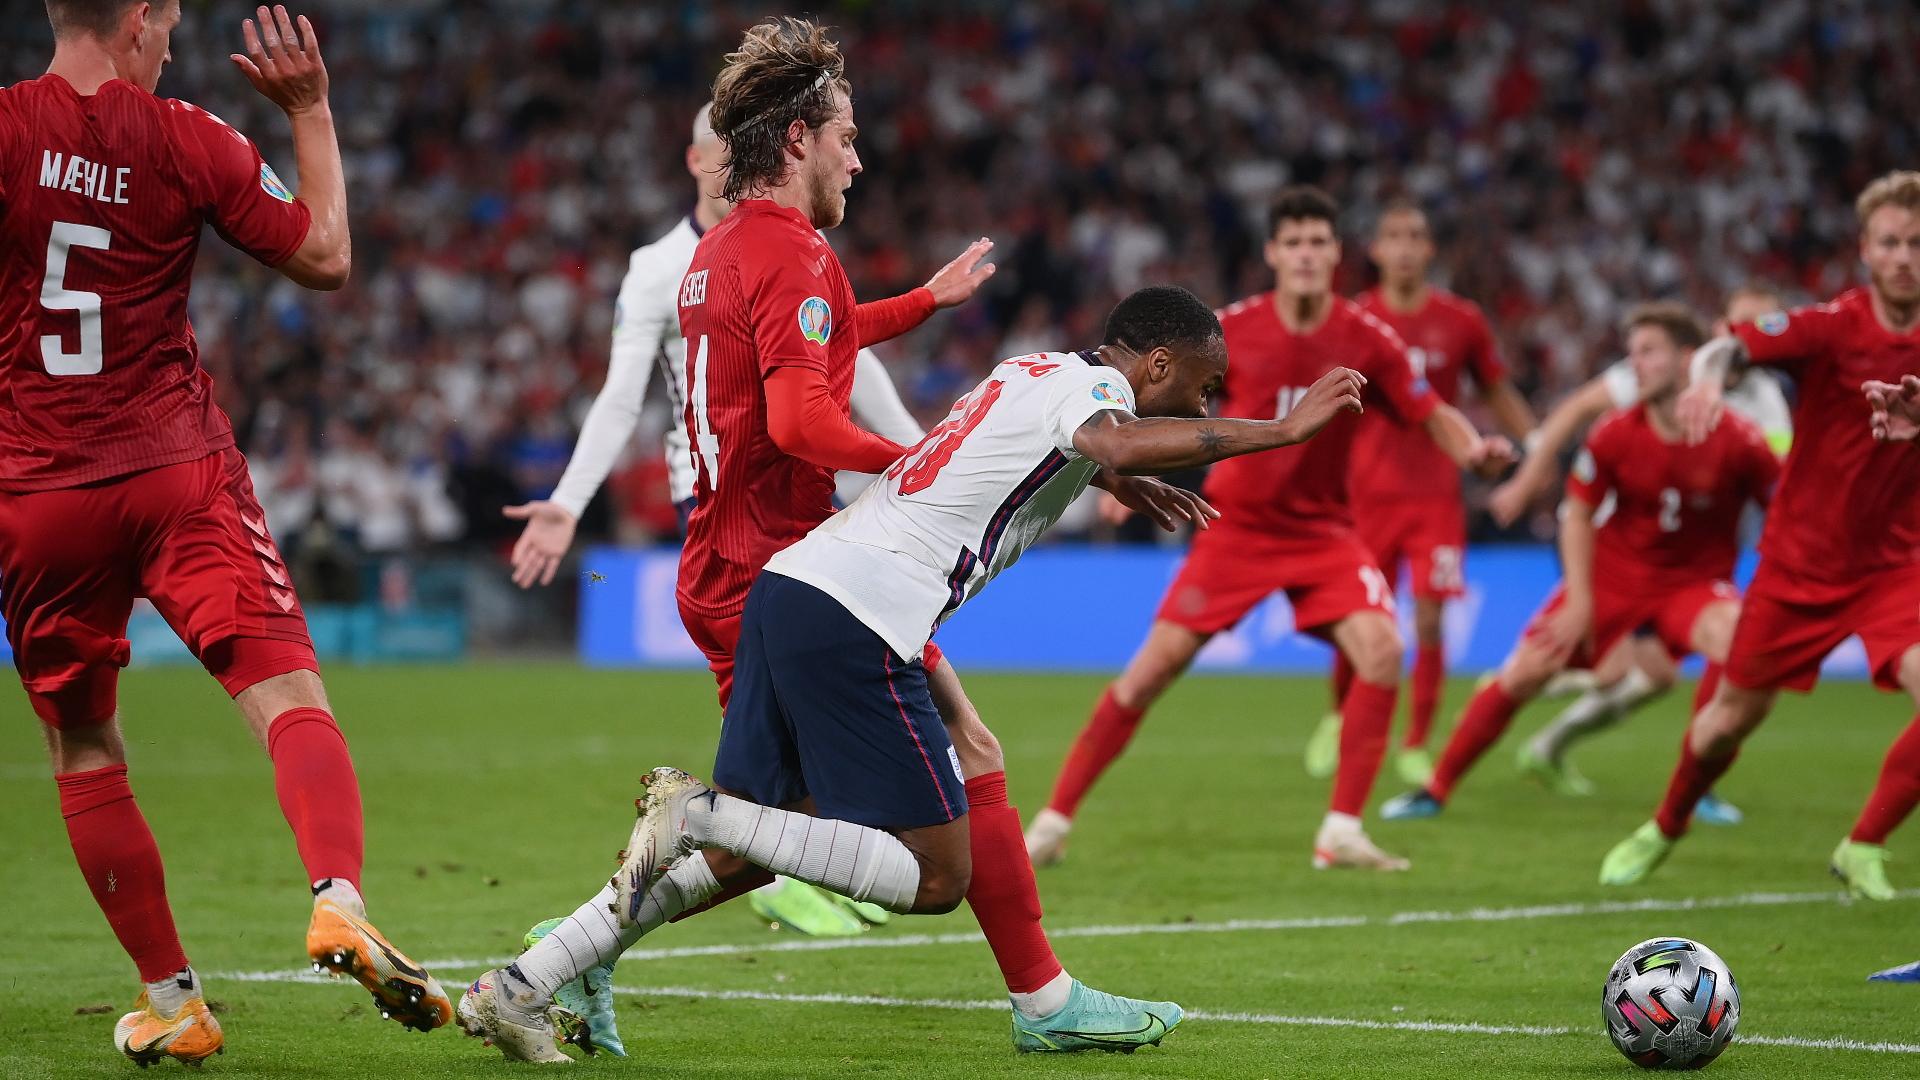 'Absolutely incomprehensible' - Sterling penalty award in Euro 2020 semi-final baffles former FIFA referee Meier